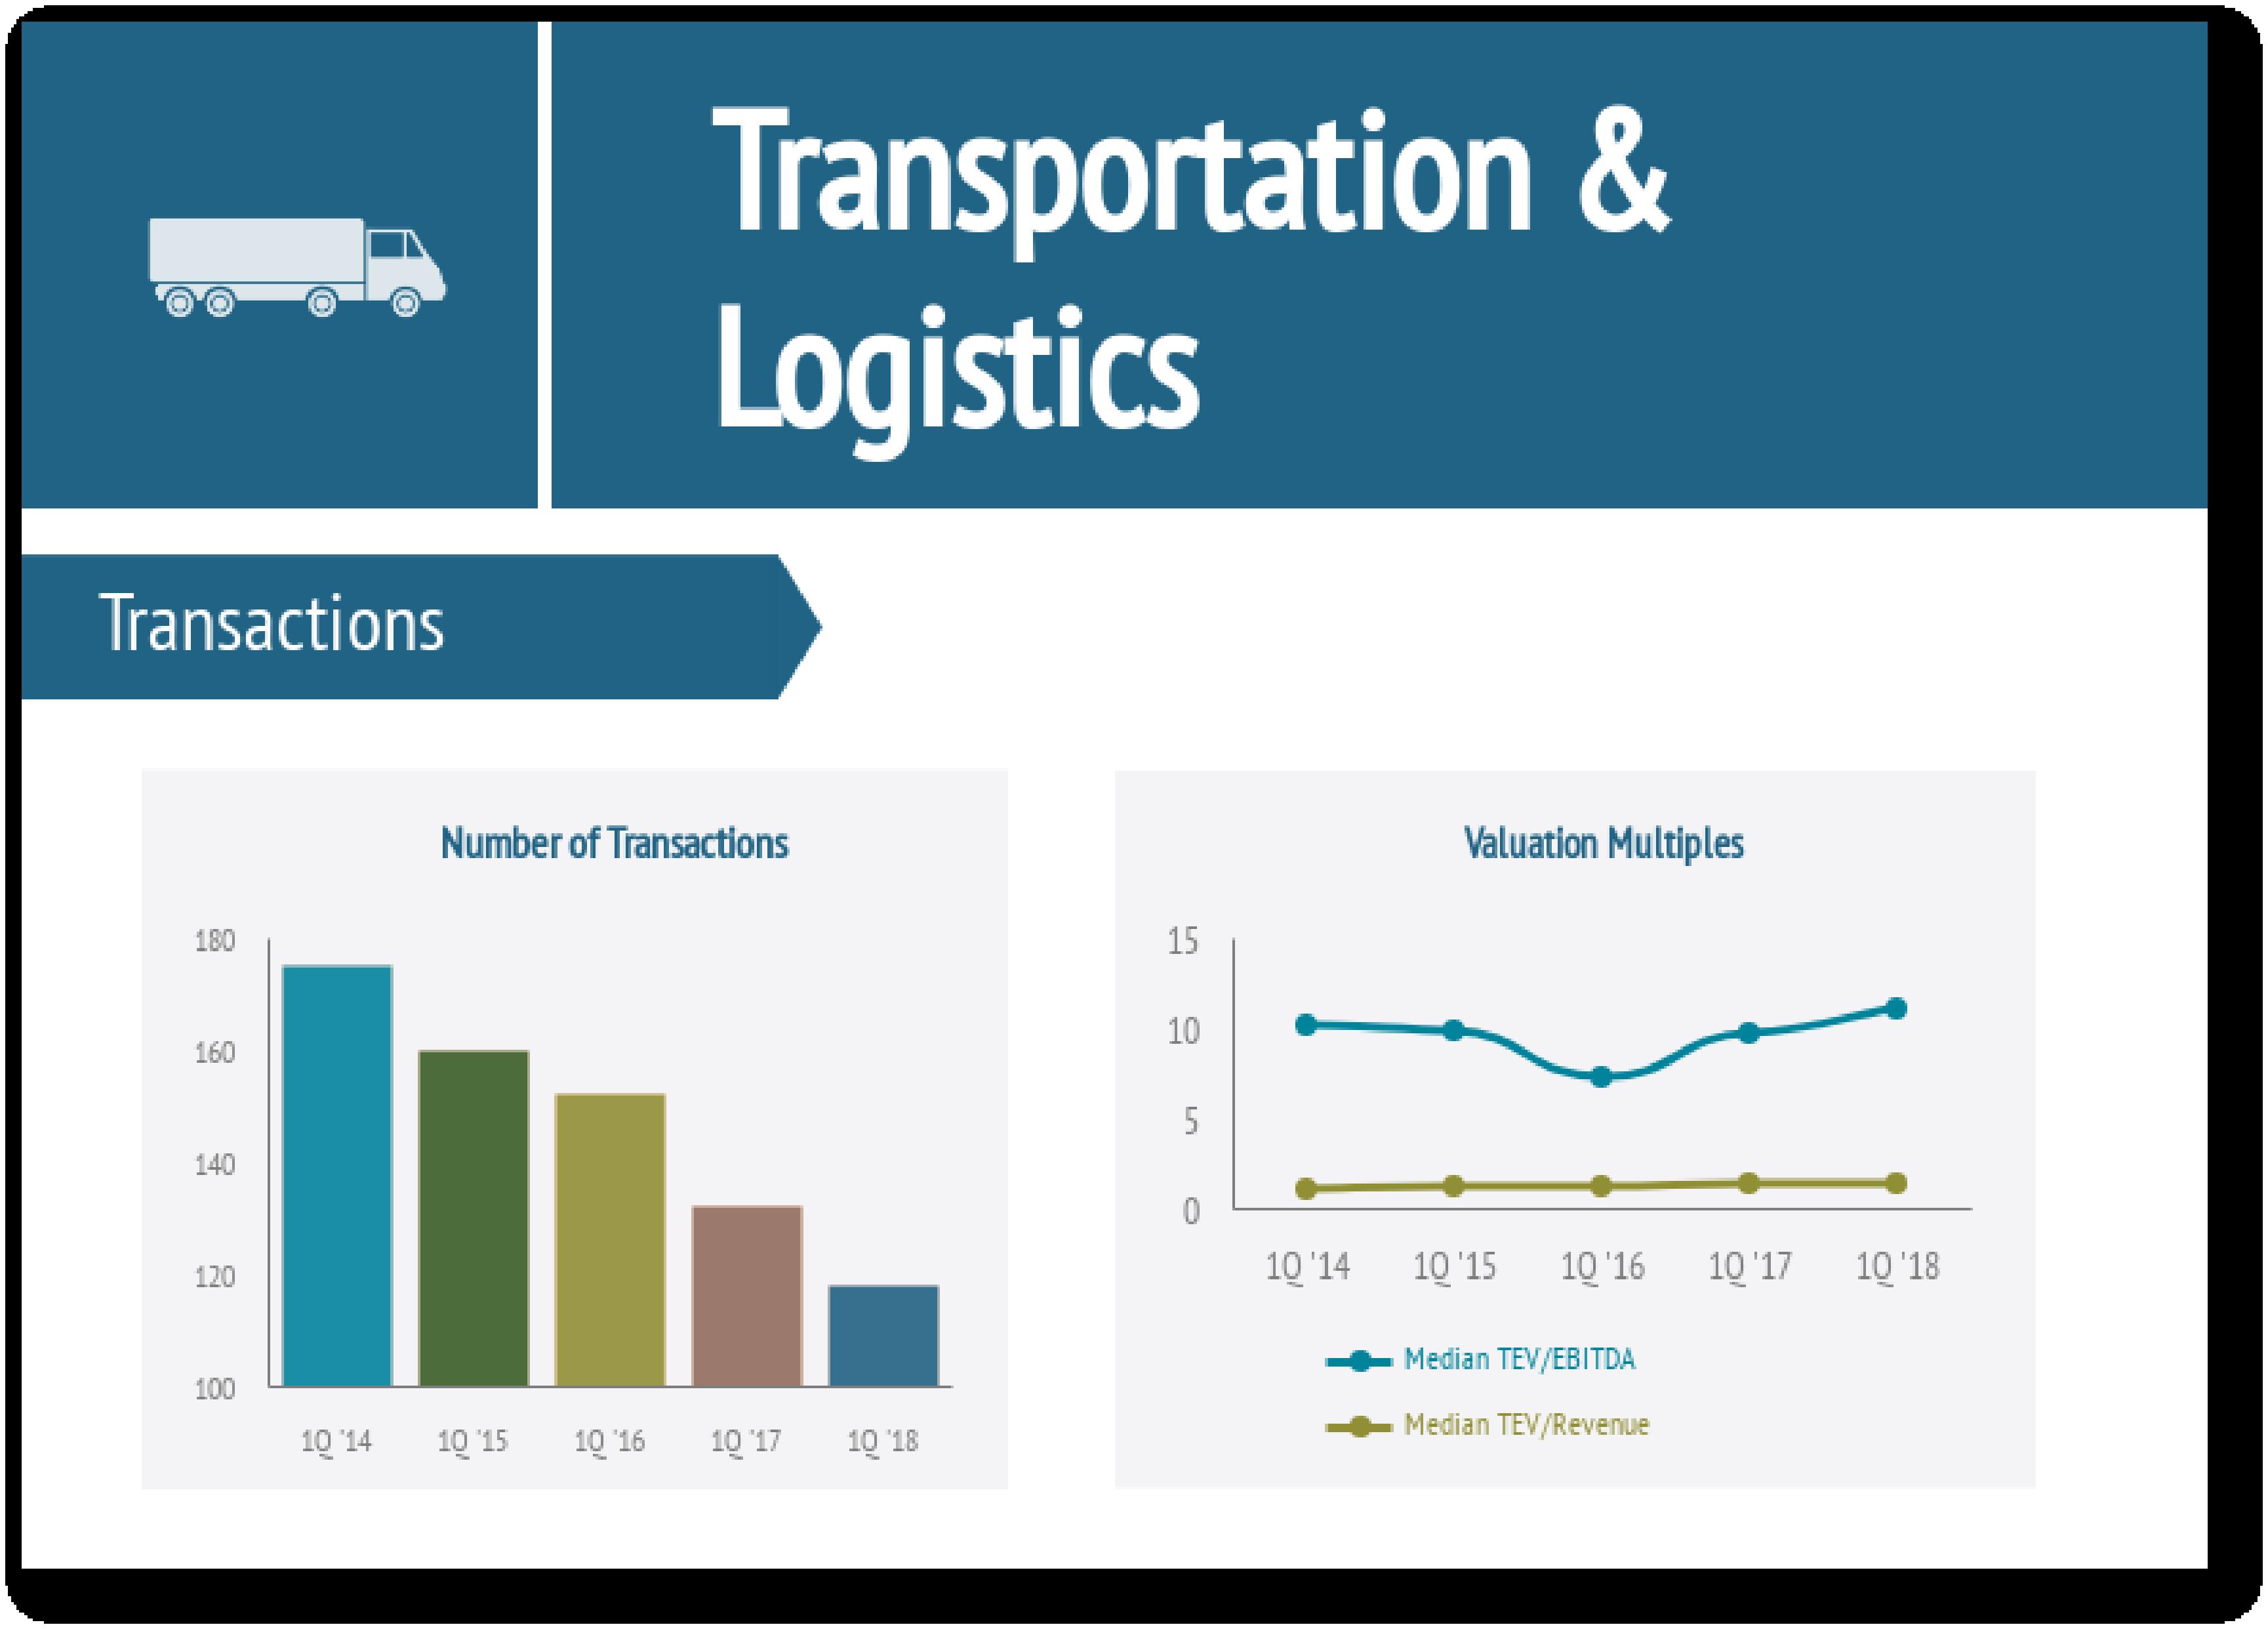 Transportation & Logistics Industry Report